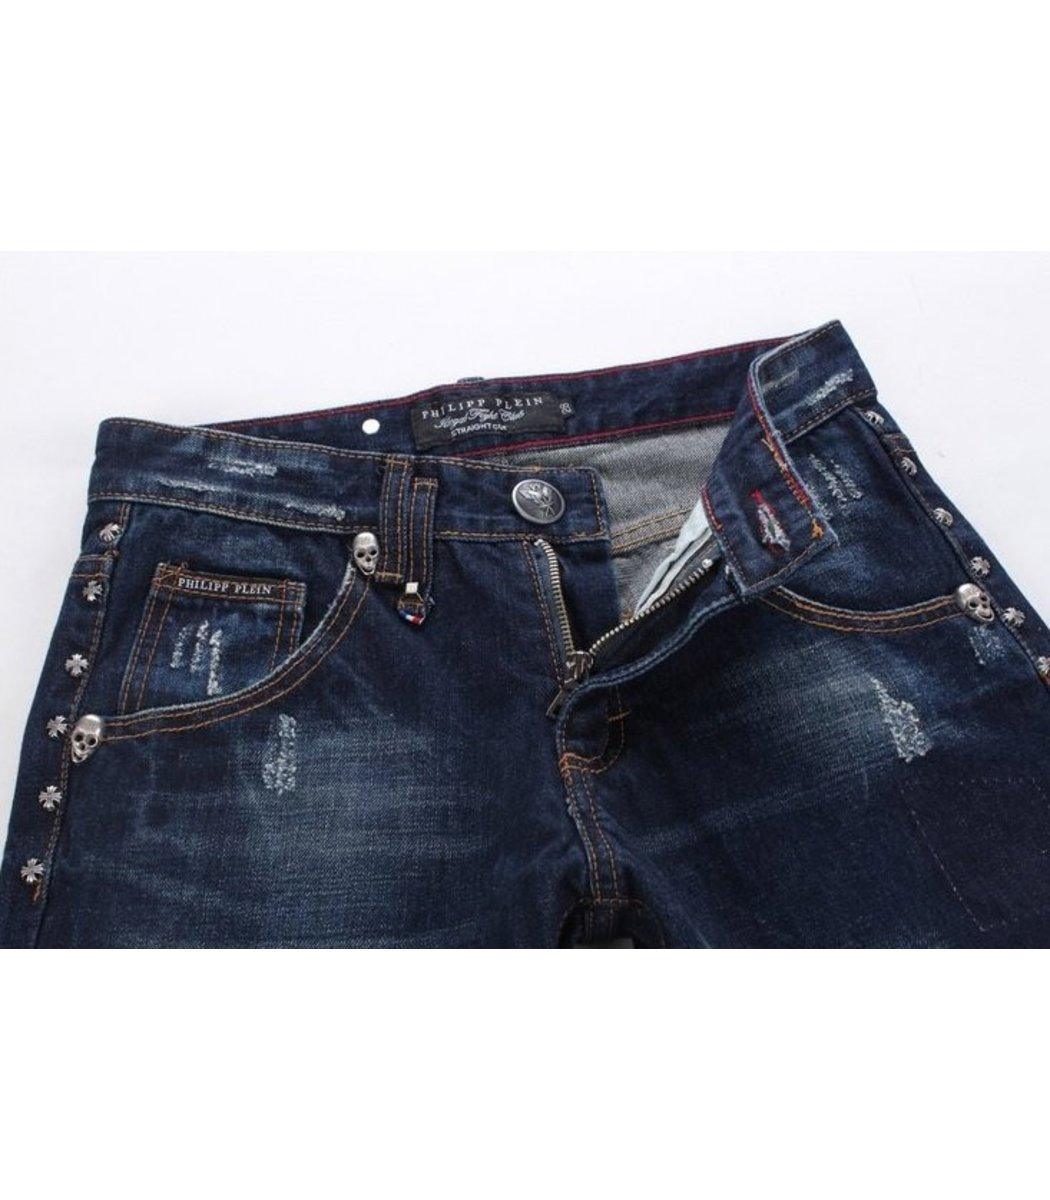 Темно-синие джинсы Philipp Plein 0137